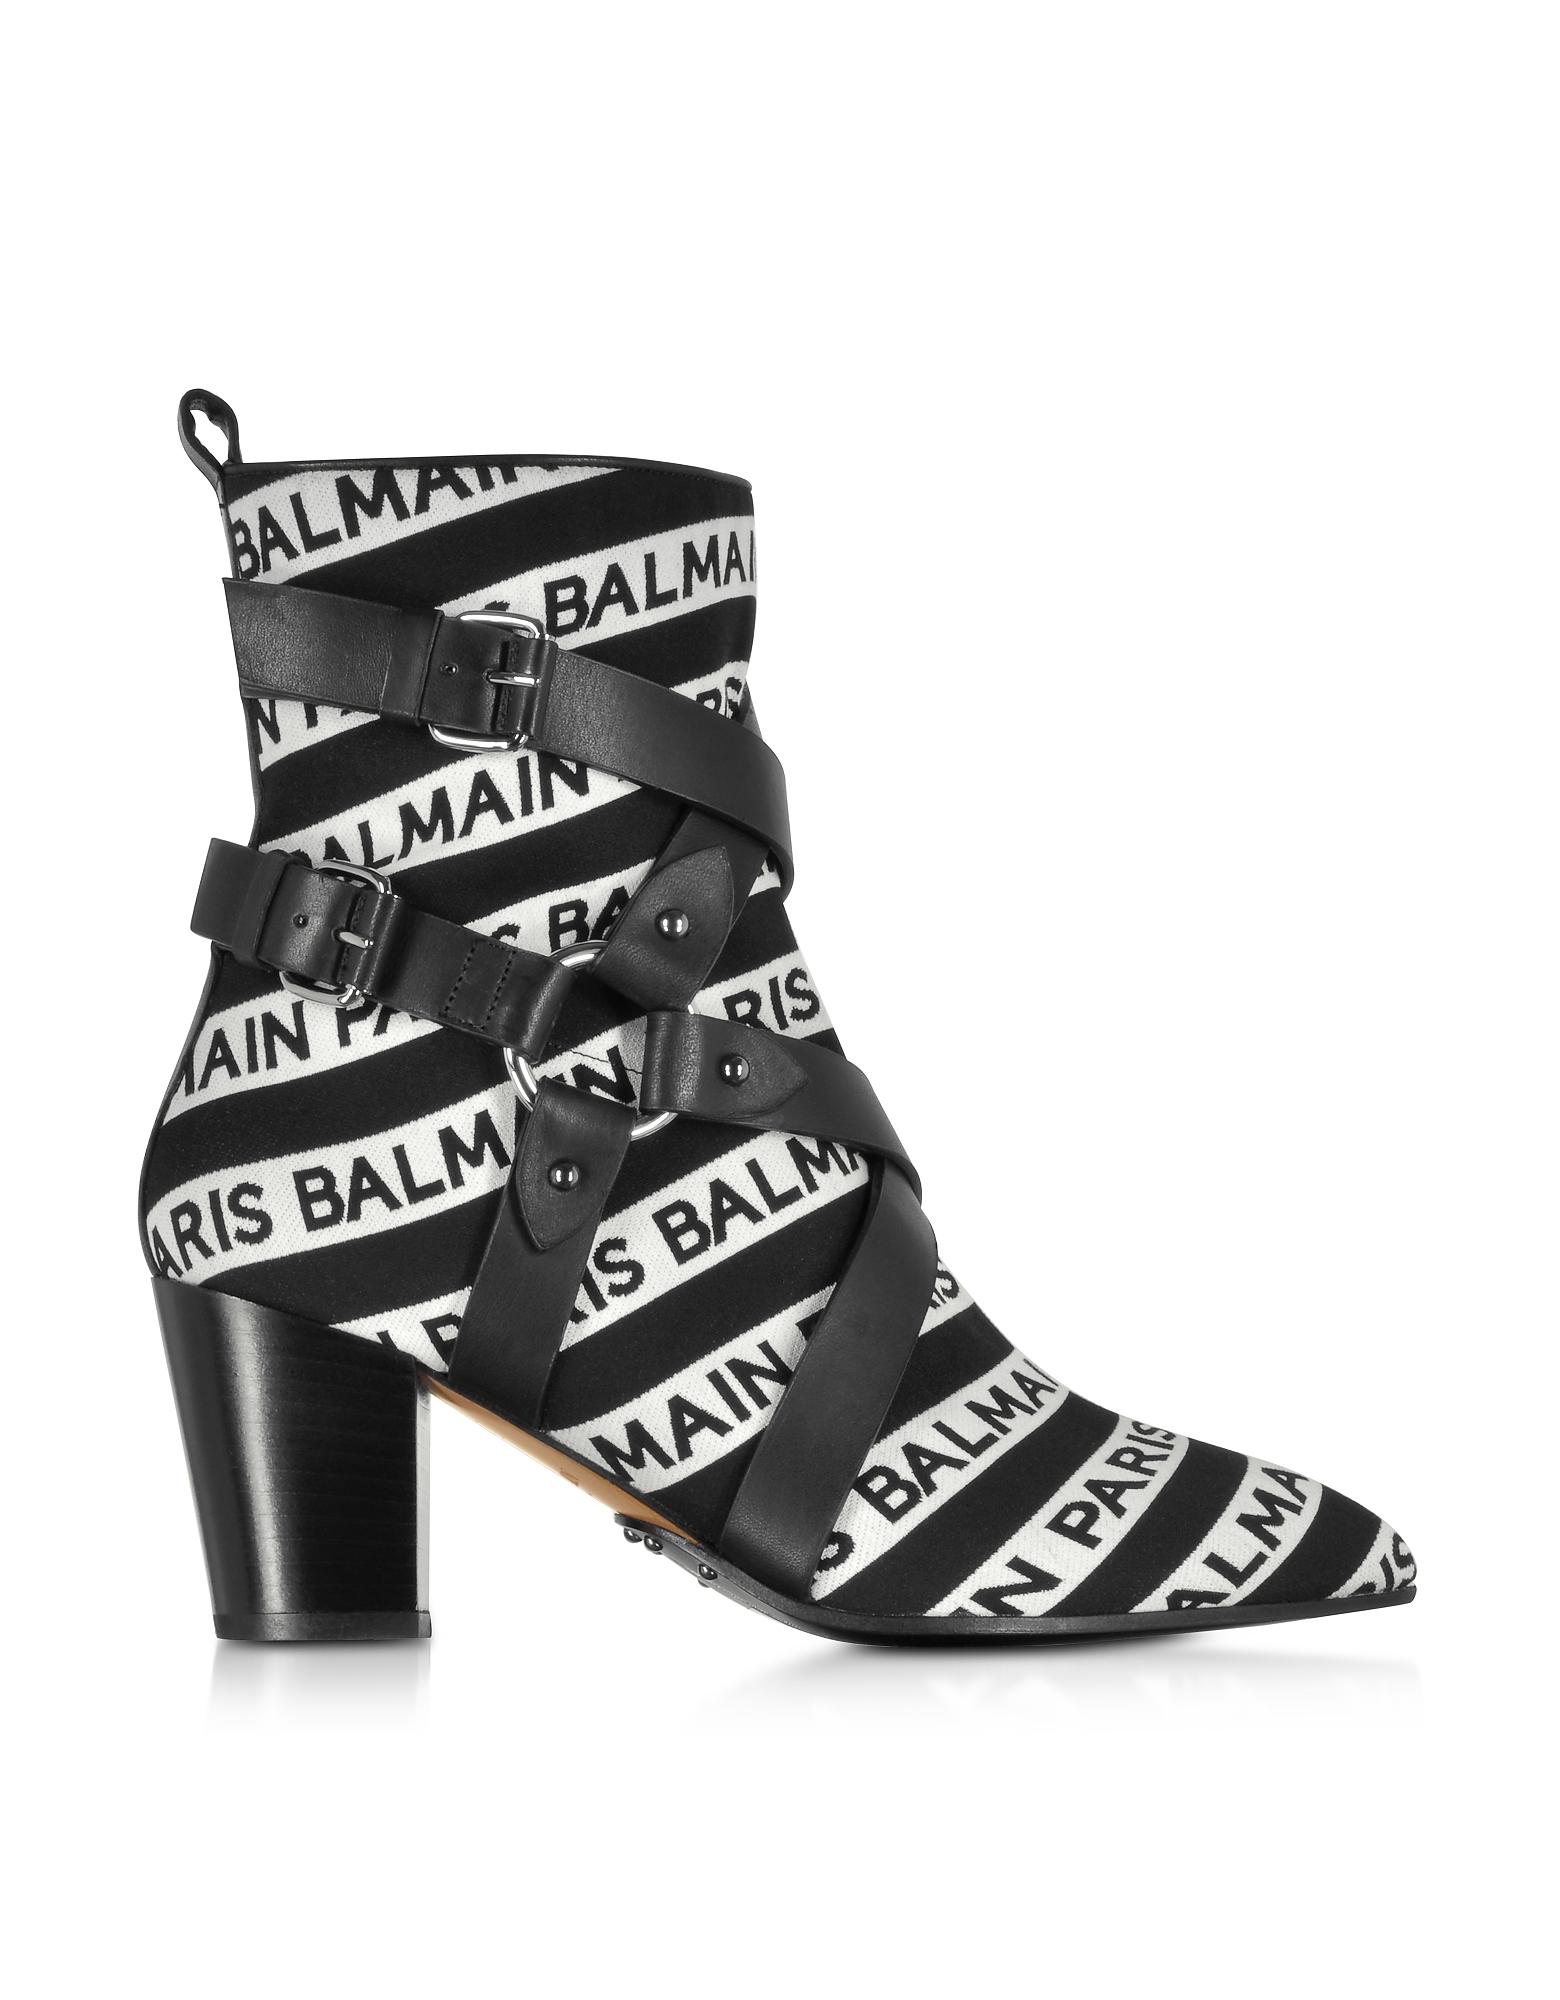 Balmain Designer Shoes, Stripe Signature Logo Jilly Boots